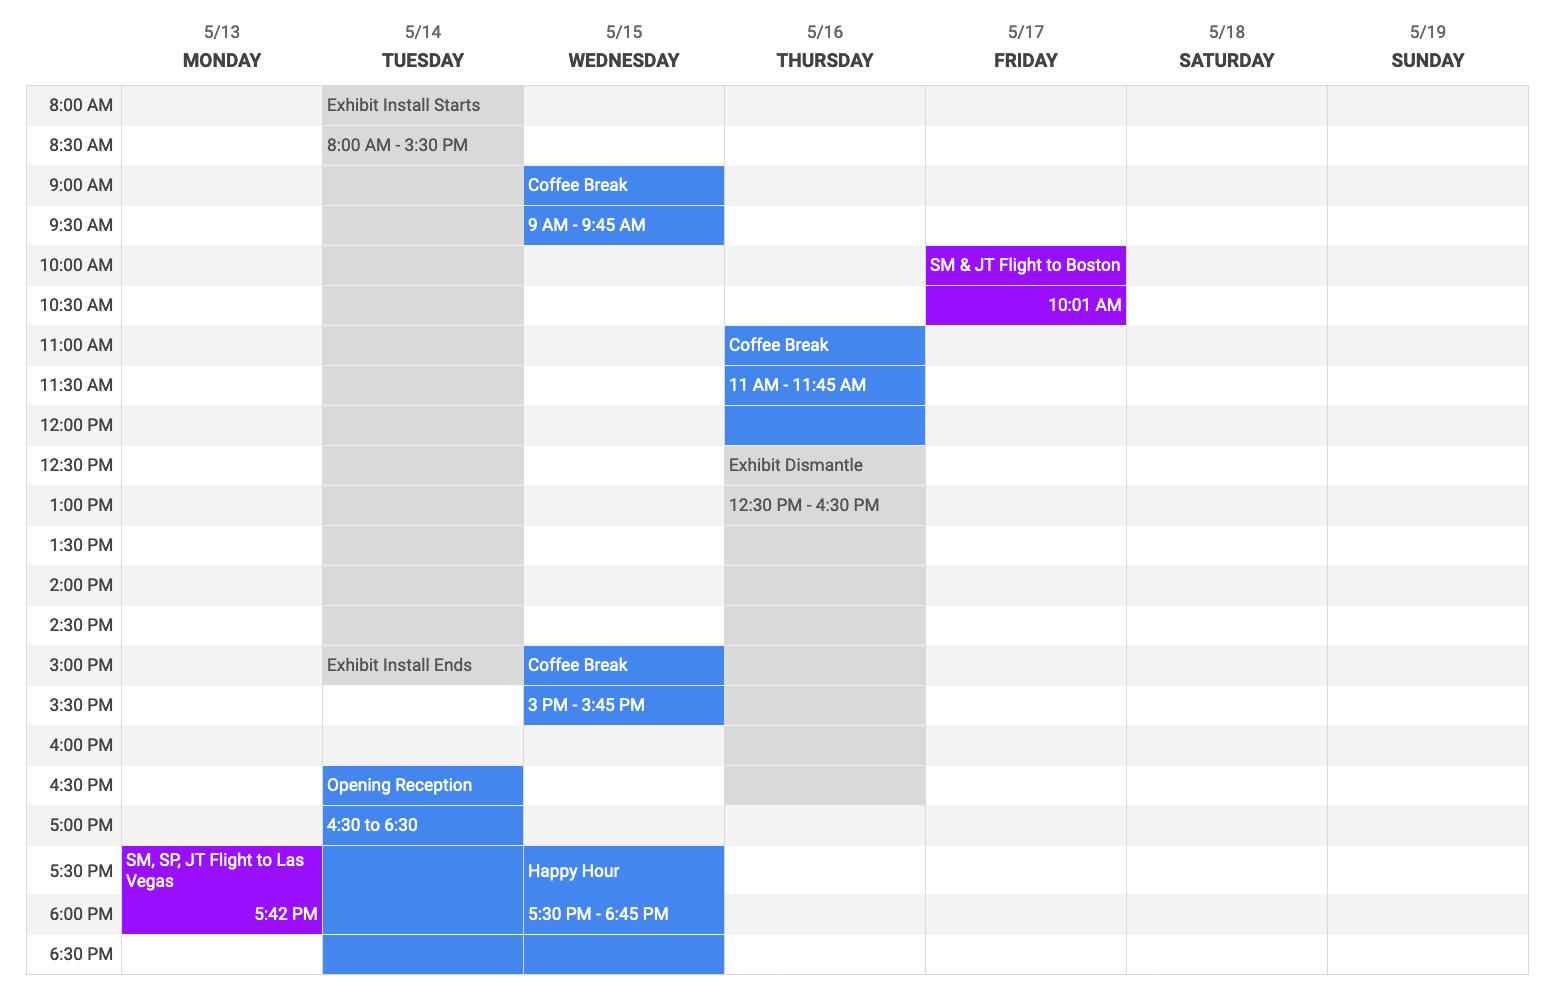 Trade show schedule